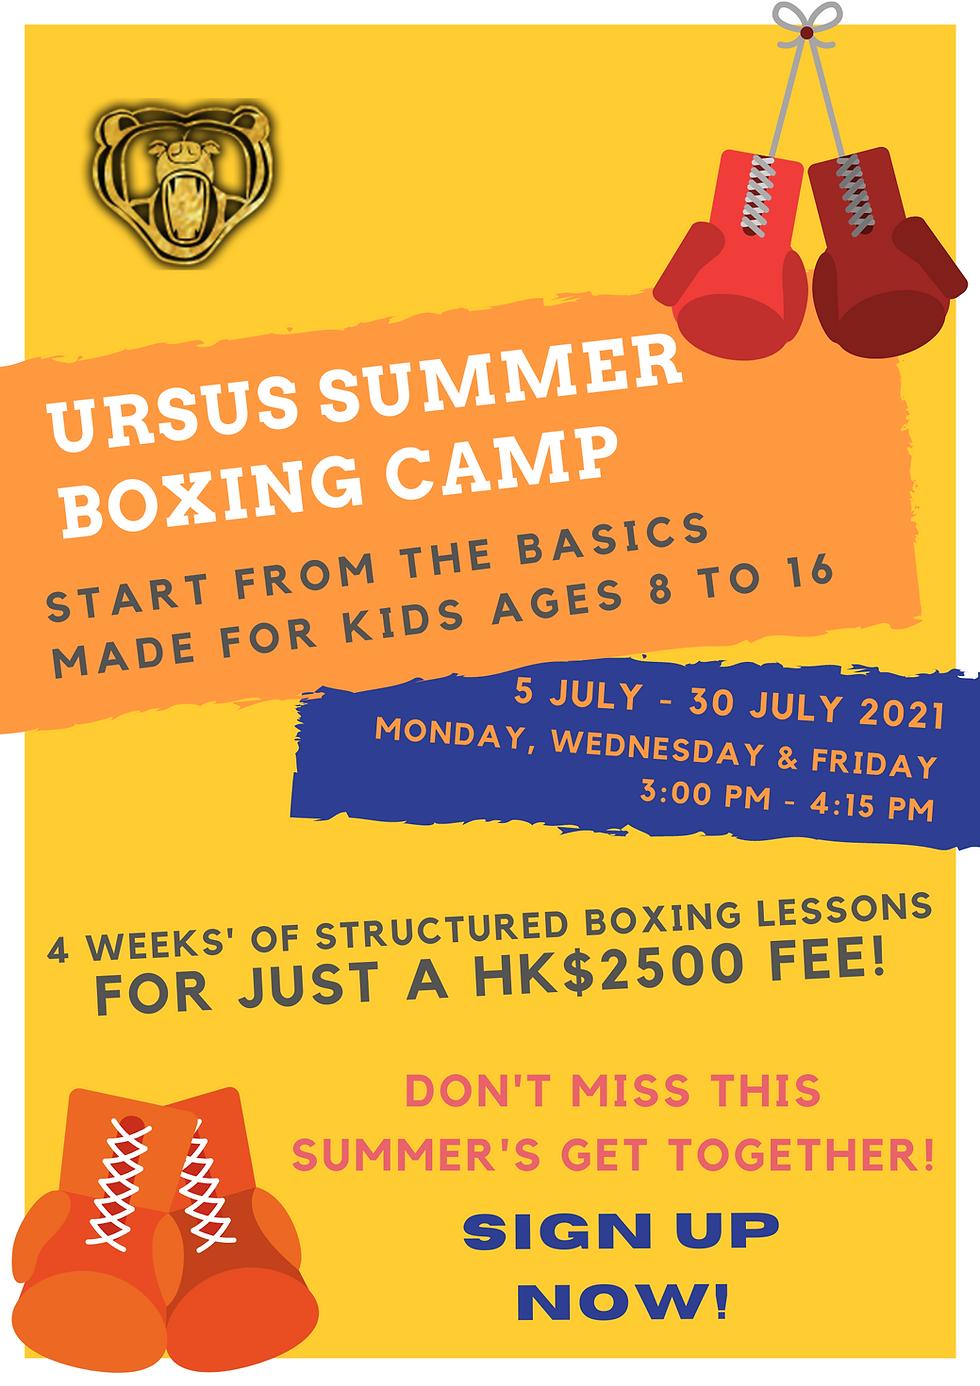 URSUS SUMMER BOXING CAMP 2021.png